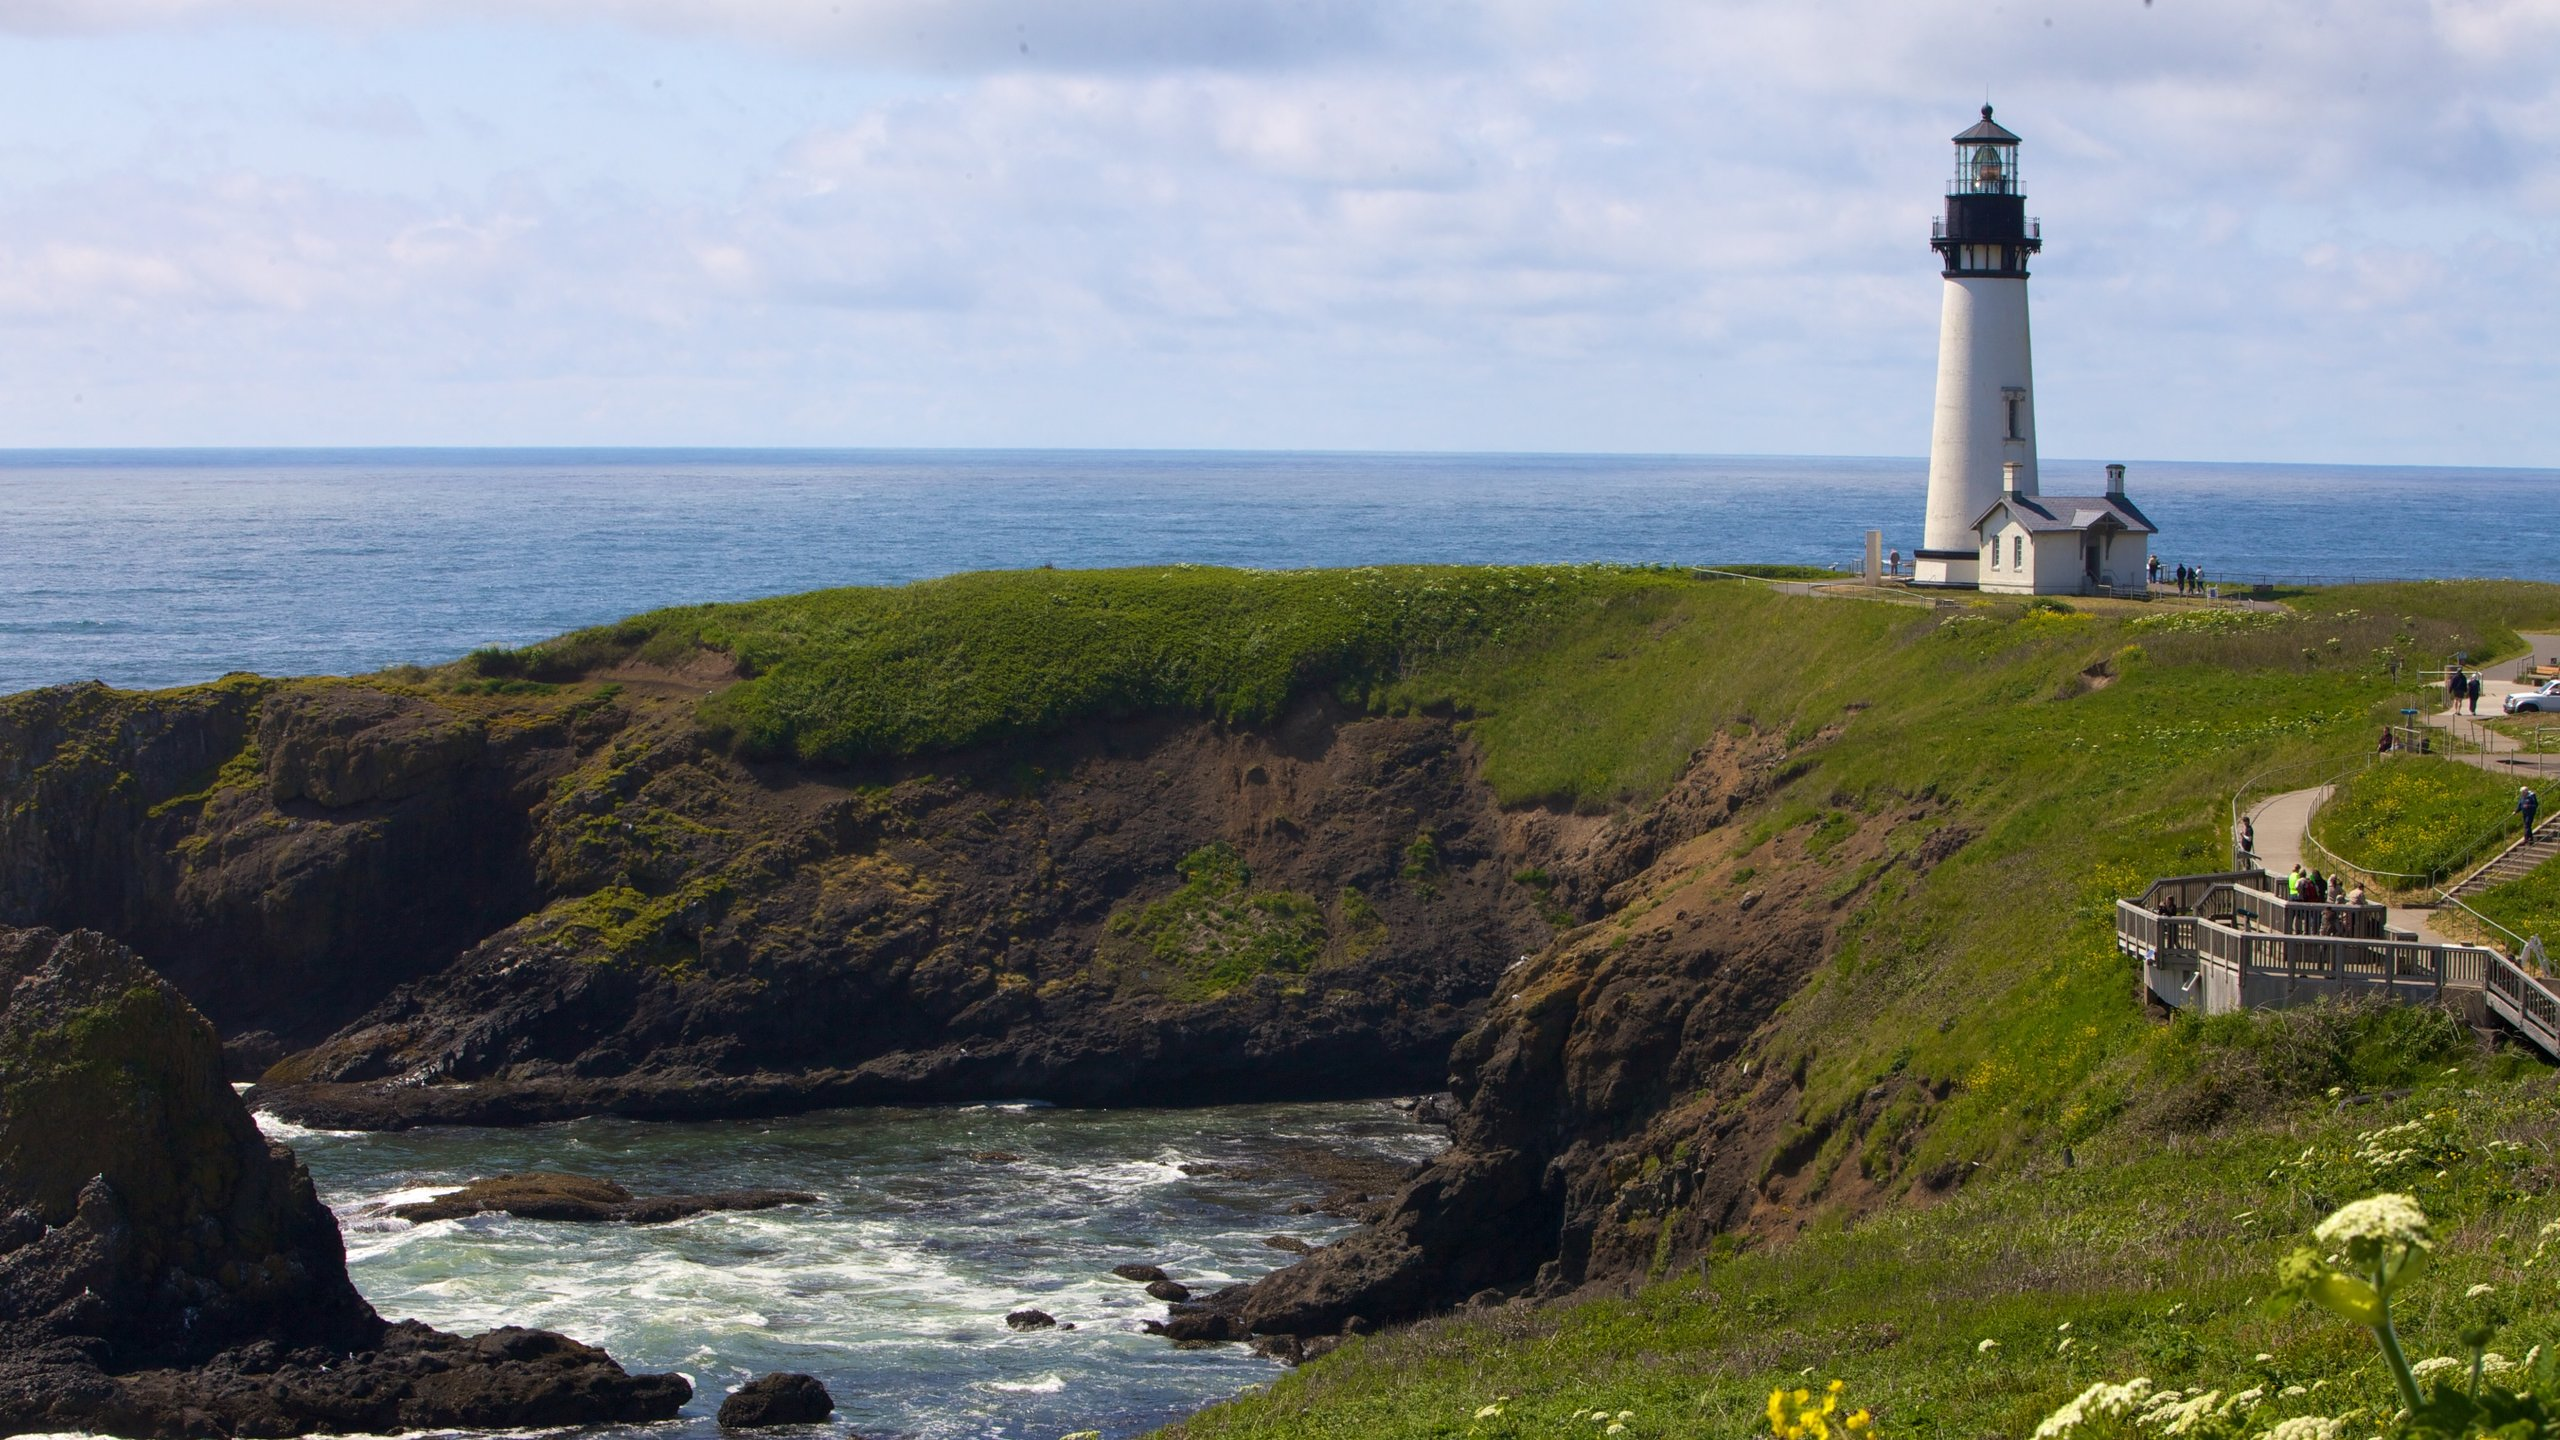 Top 10 Pet Friendly Hotels In North Oregon Coast, OR $82: Dog & Cat